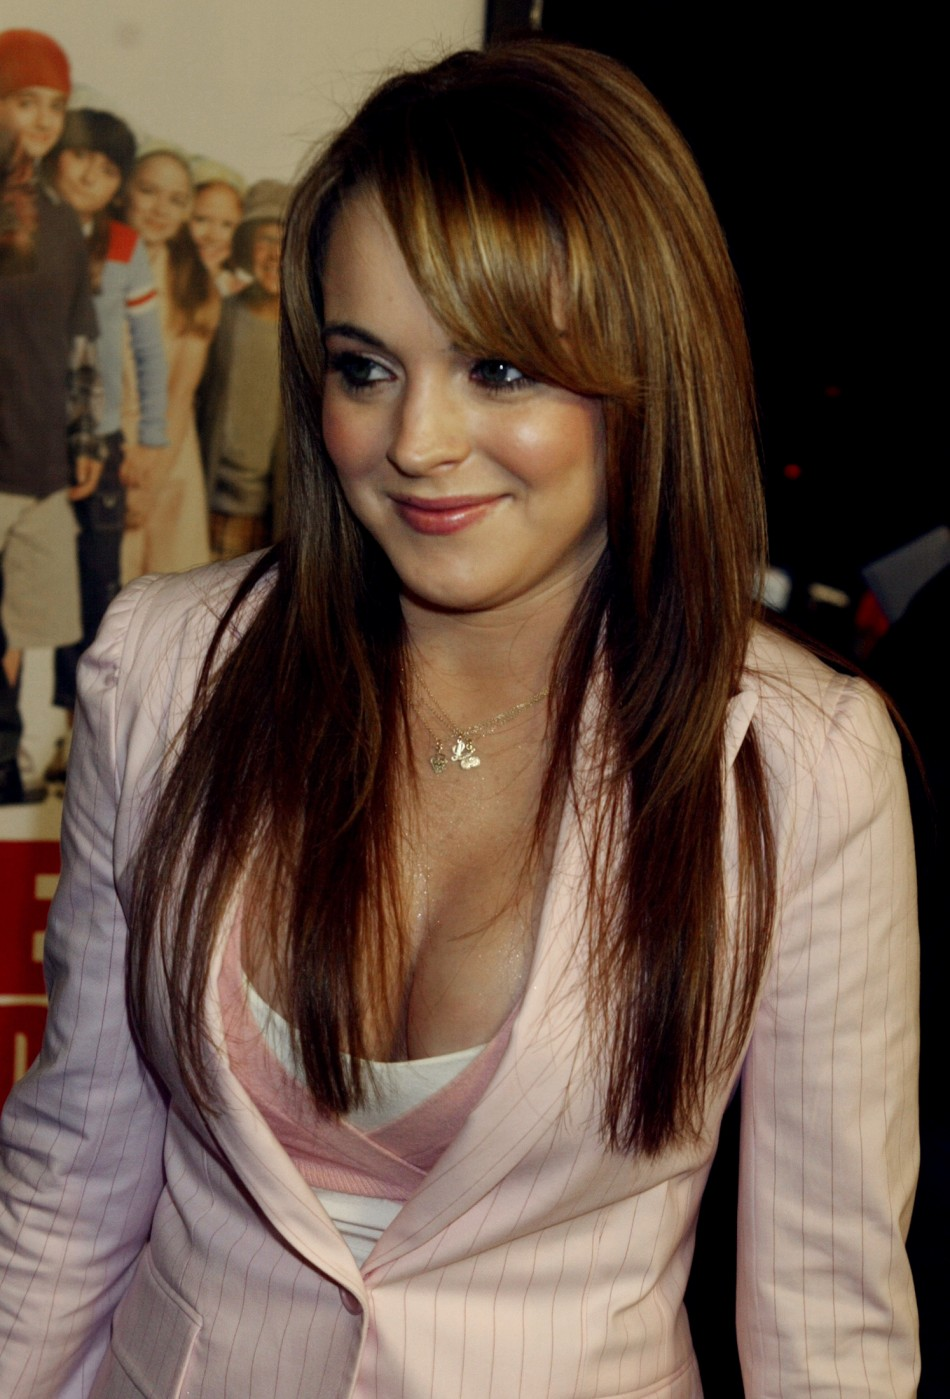 Is Lindsay Lohan Headed the Same Way as Amy Winehouse? Her ... Lindsay Lohan